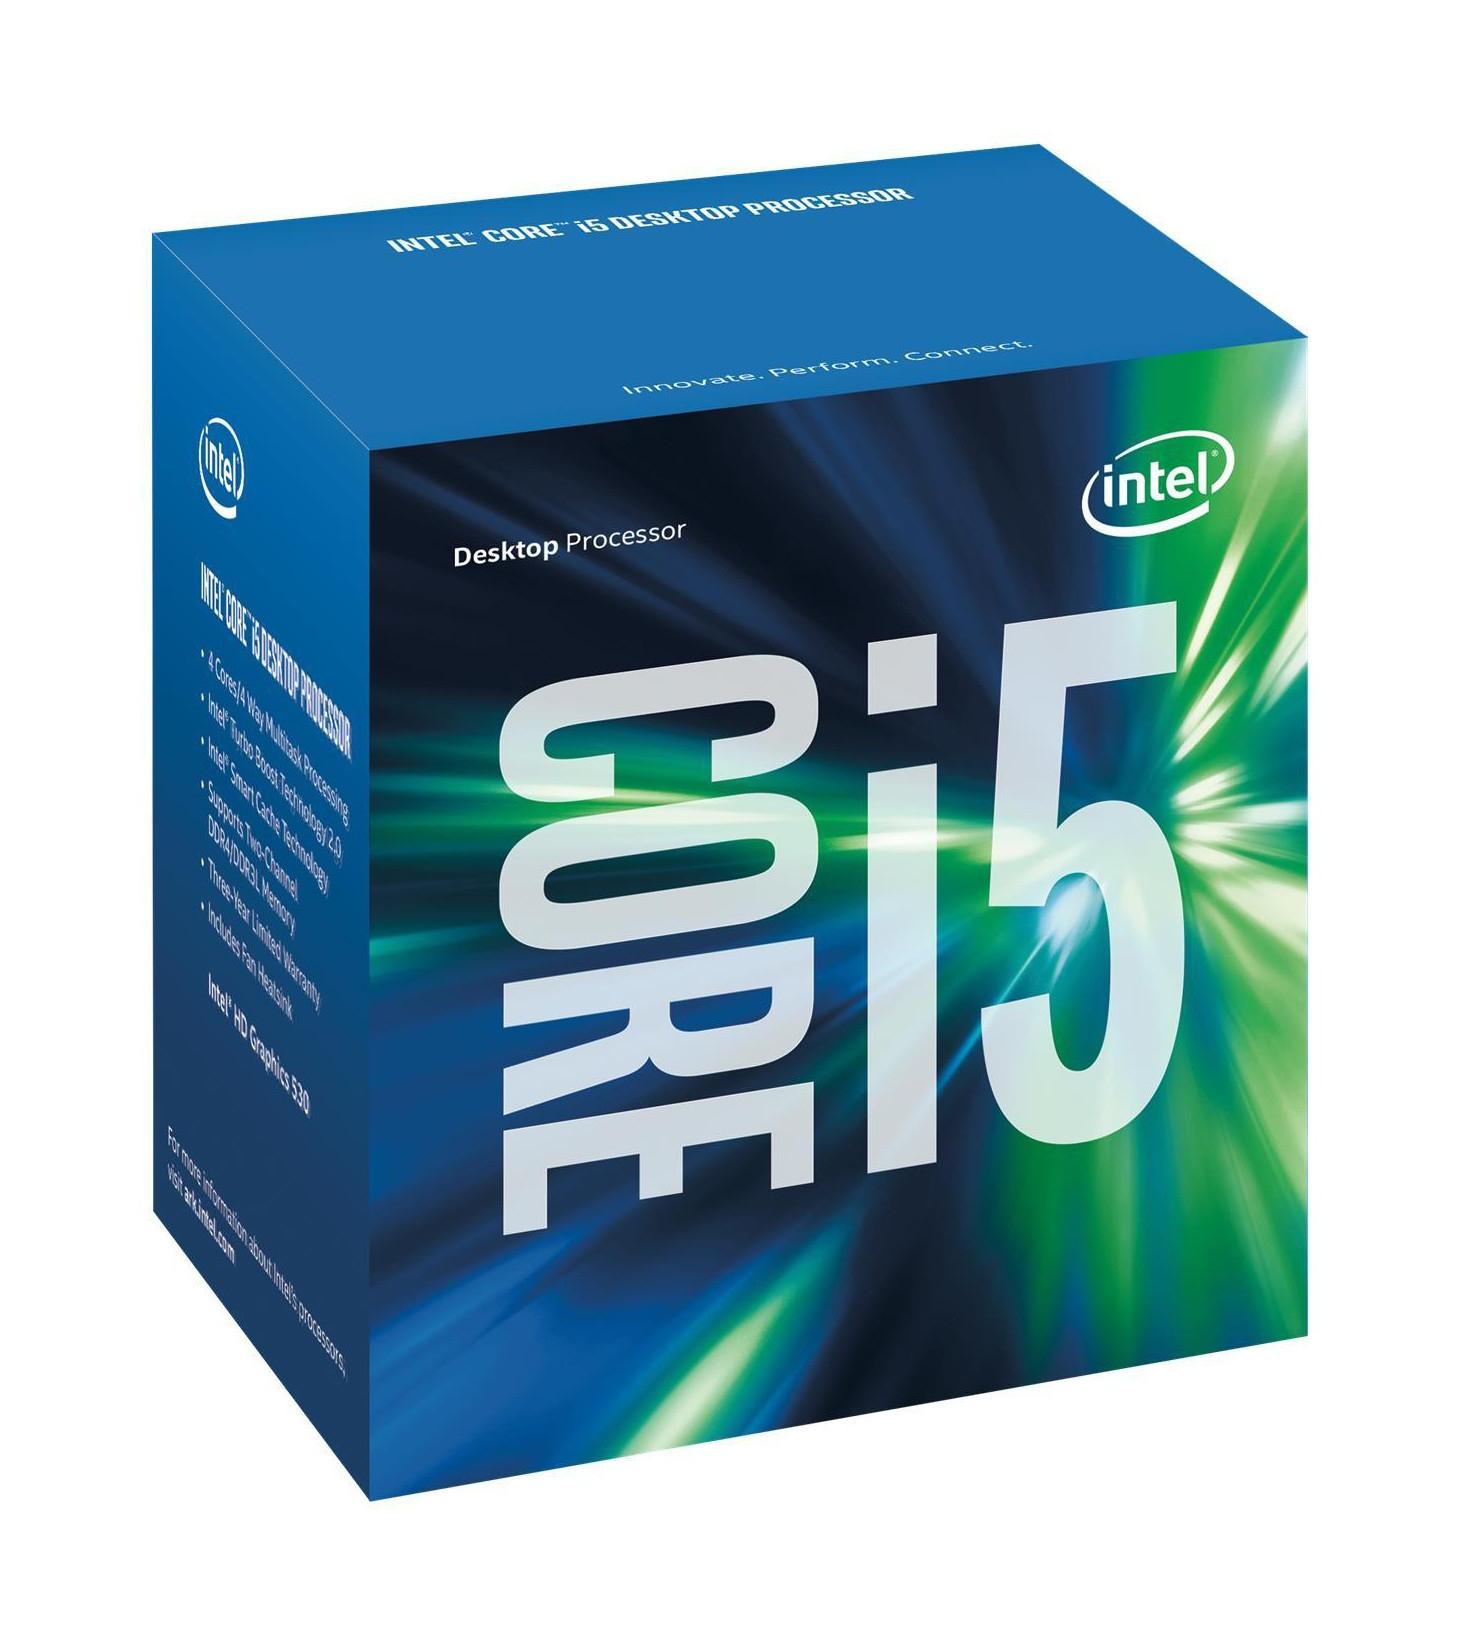 intel_core_i5-6500_32ghz_lga1151_6mb_cache_up_to_360ghz_fc-lga14c_skylake_box-34173680-2